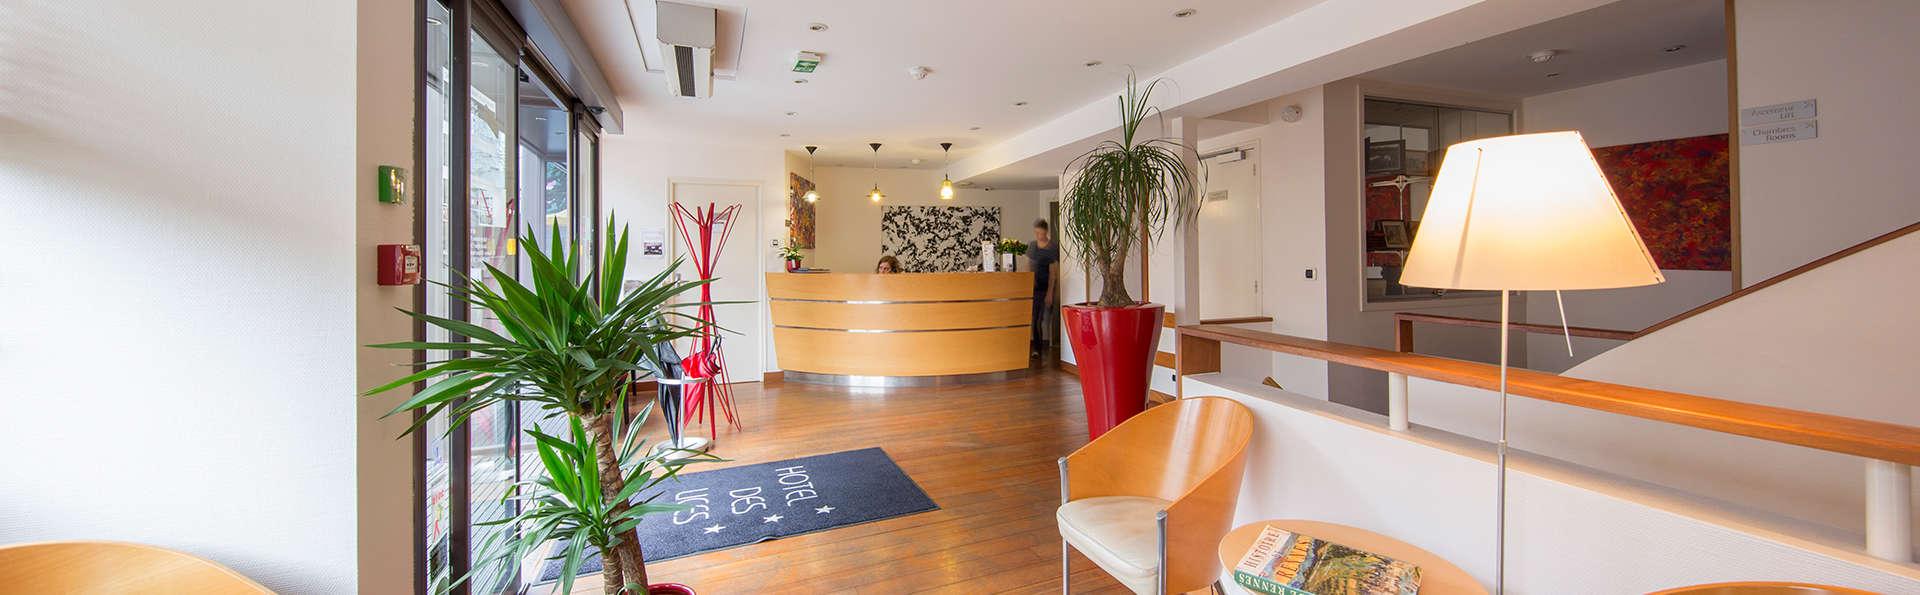 Hôtel des Lices - EDIT_lobby1.jpg